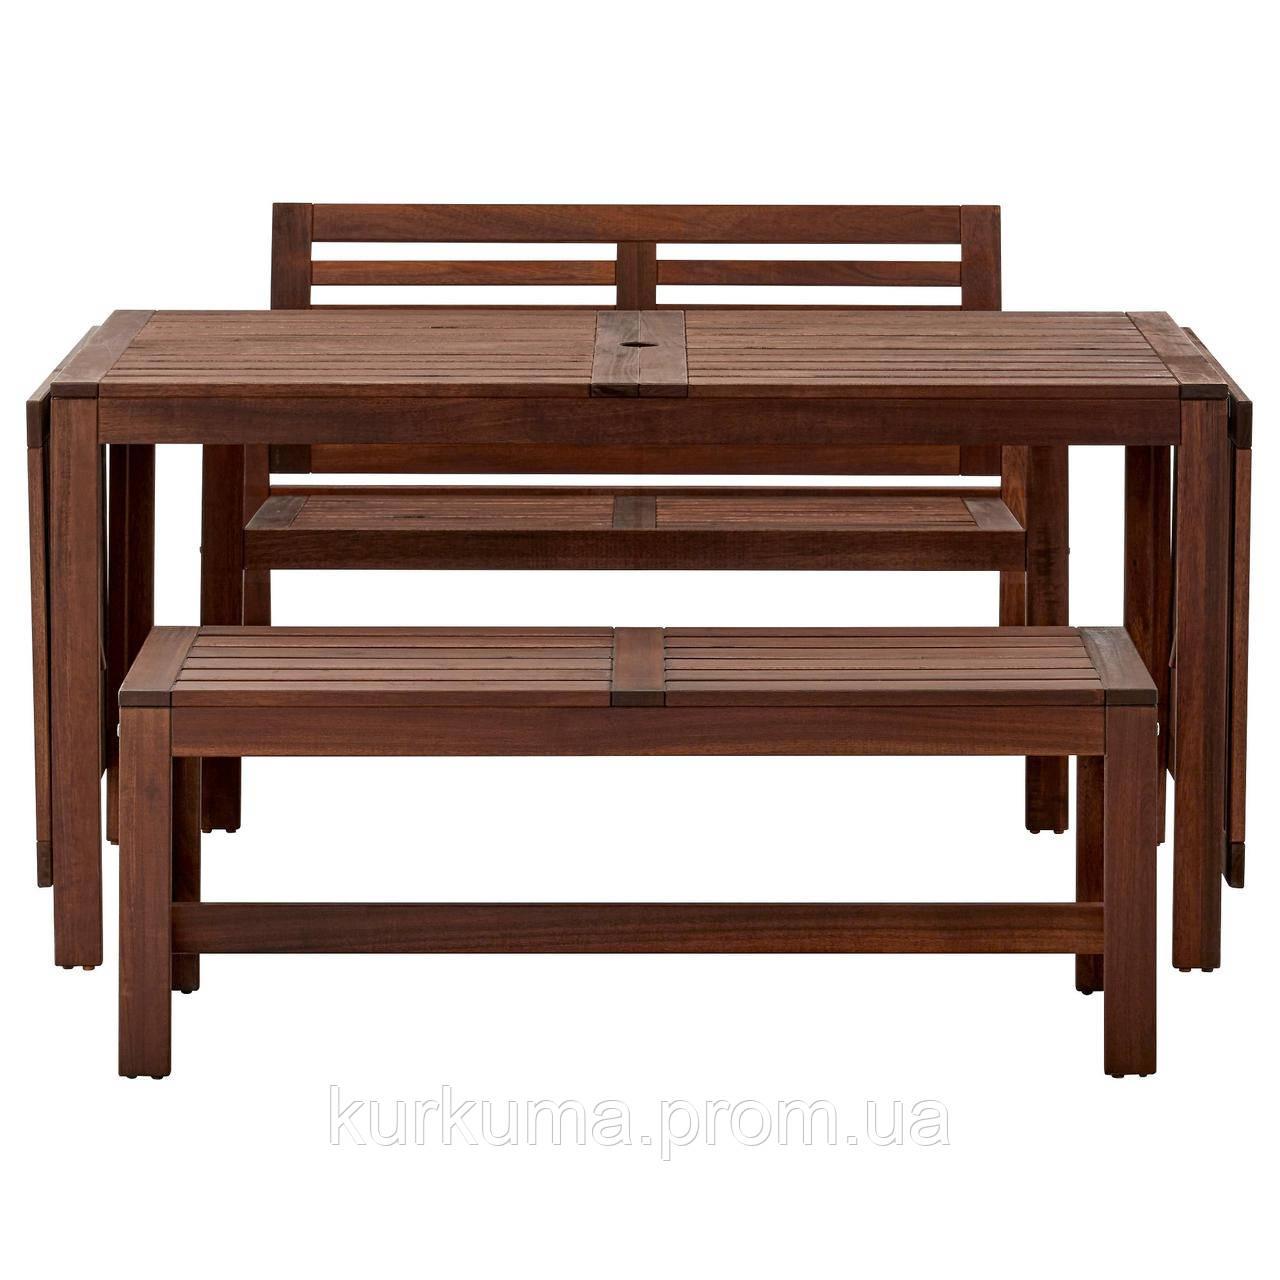 IKEA APPLARO Садовый стол и 2 скамейки, коричневая морилка  (390.539.31)